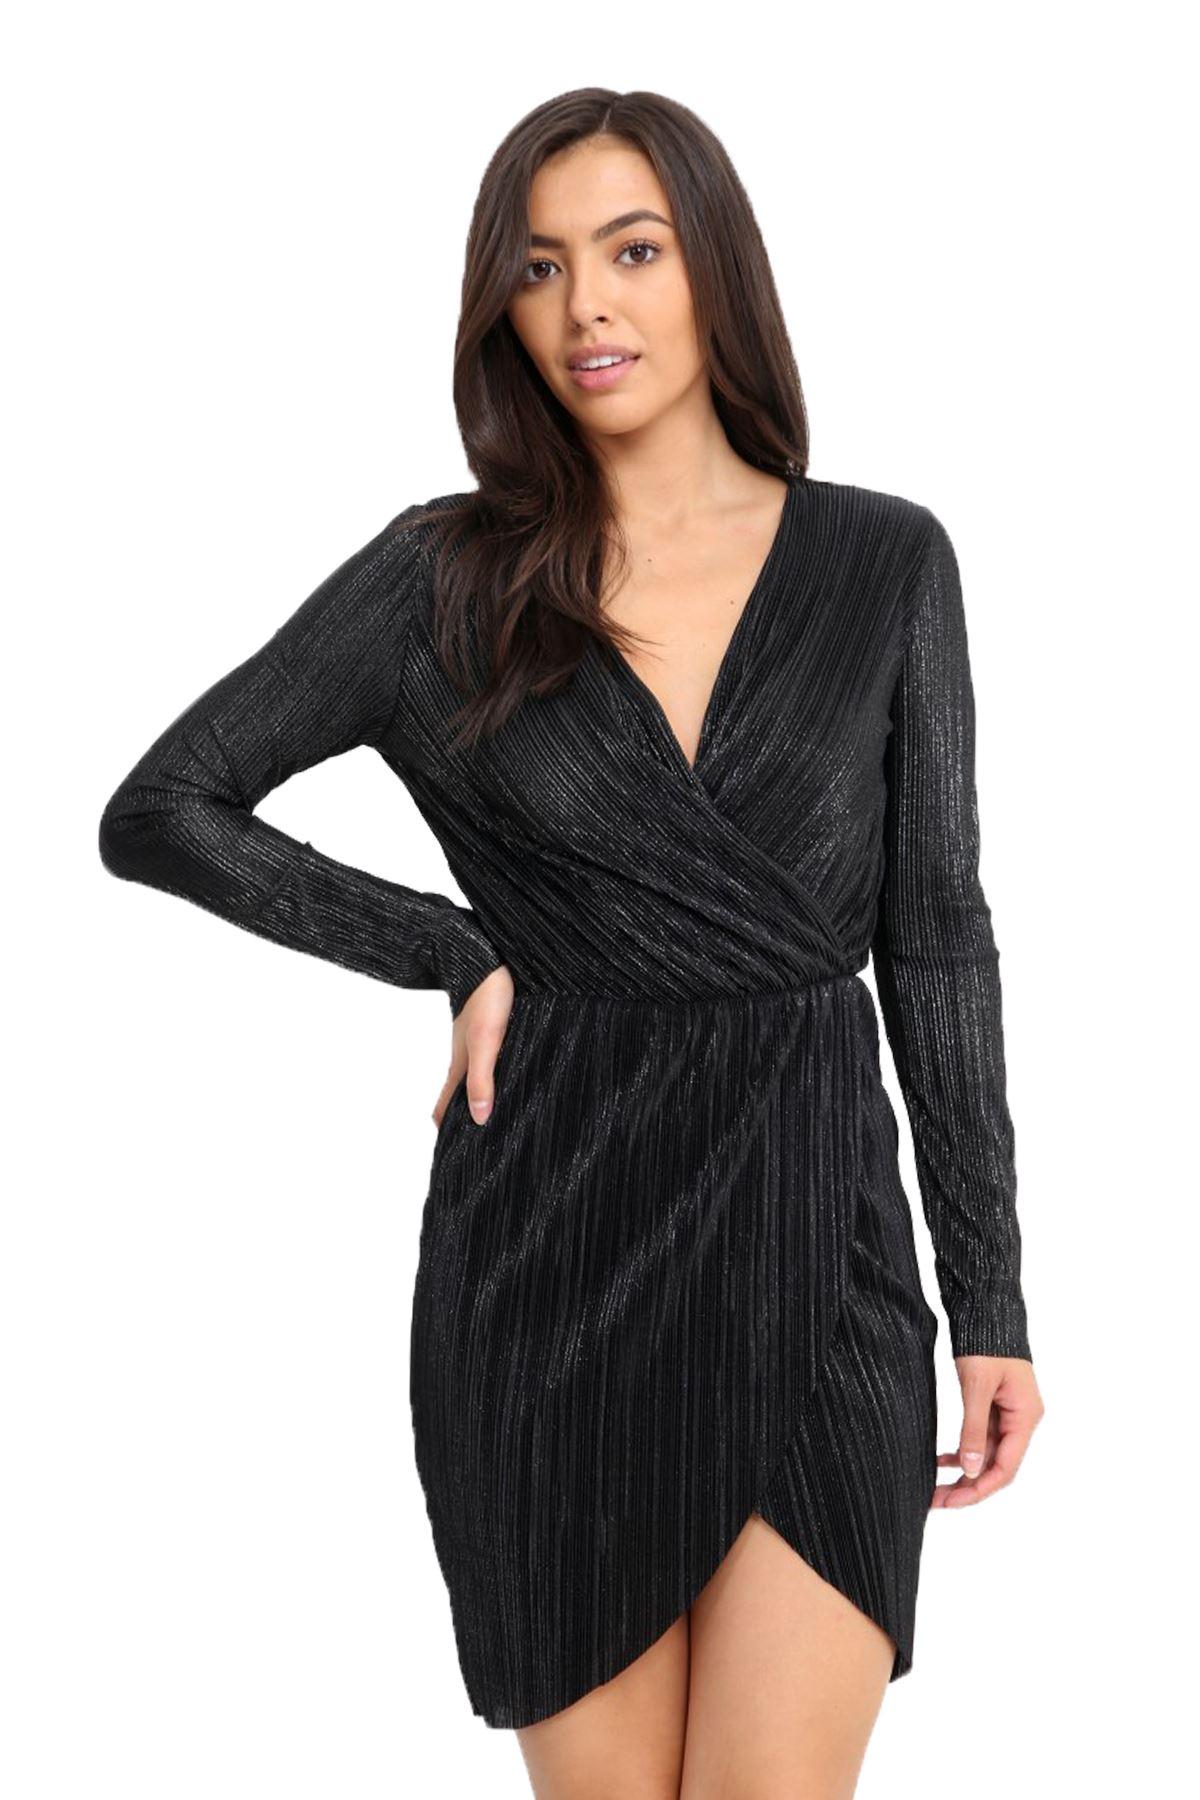 426a82944085 Ladies Long Sleeve Crimp Metallic Look Wrap V Neck Plunge Bodycon Mini Dress